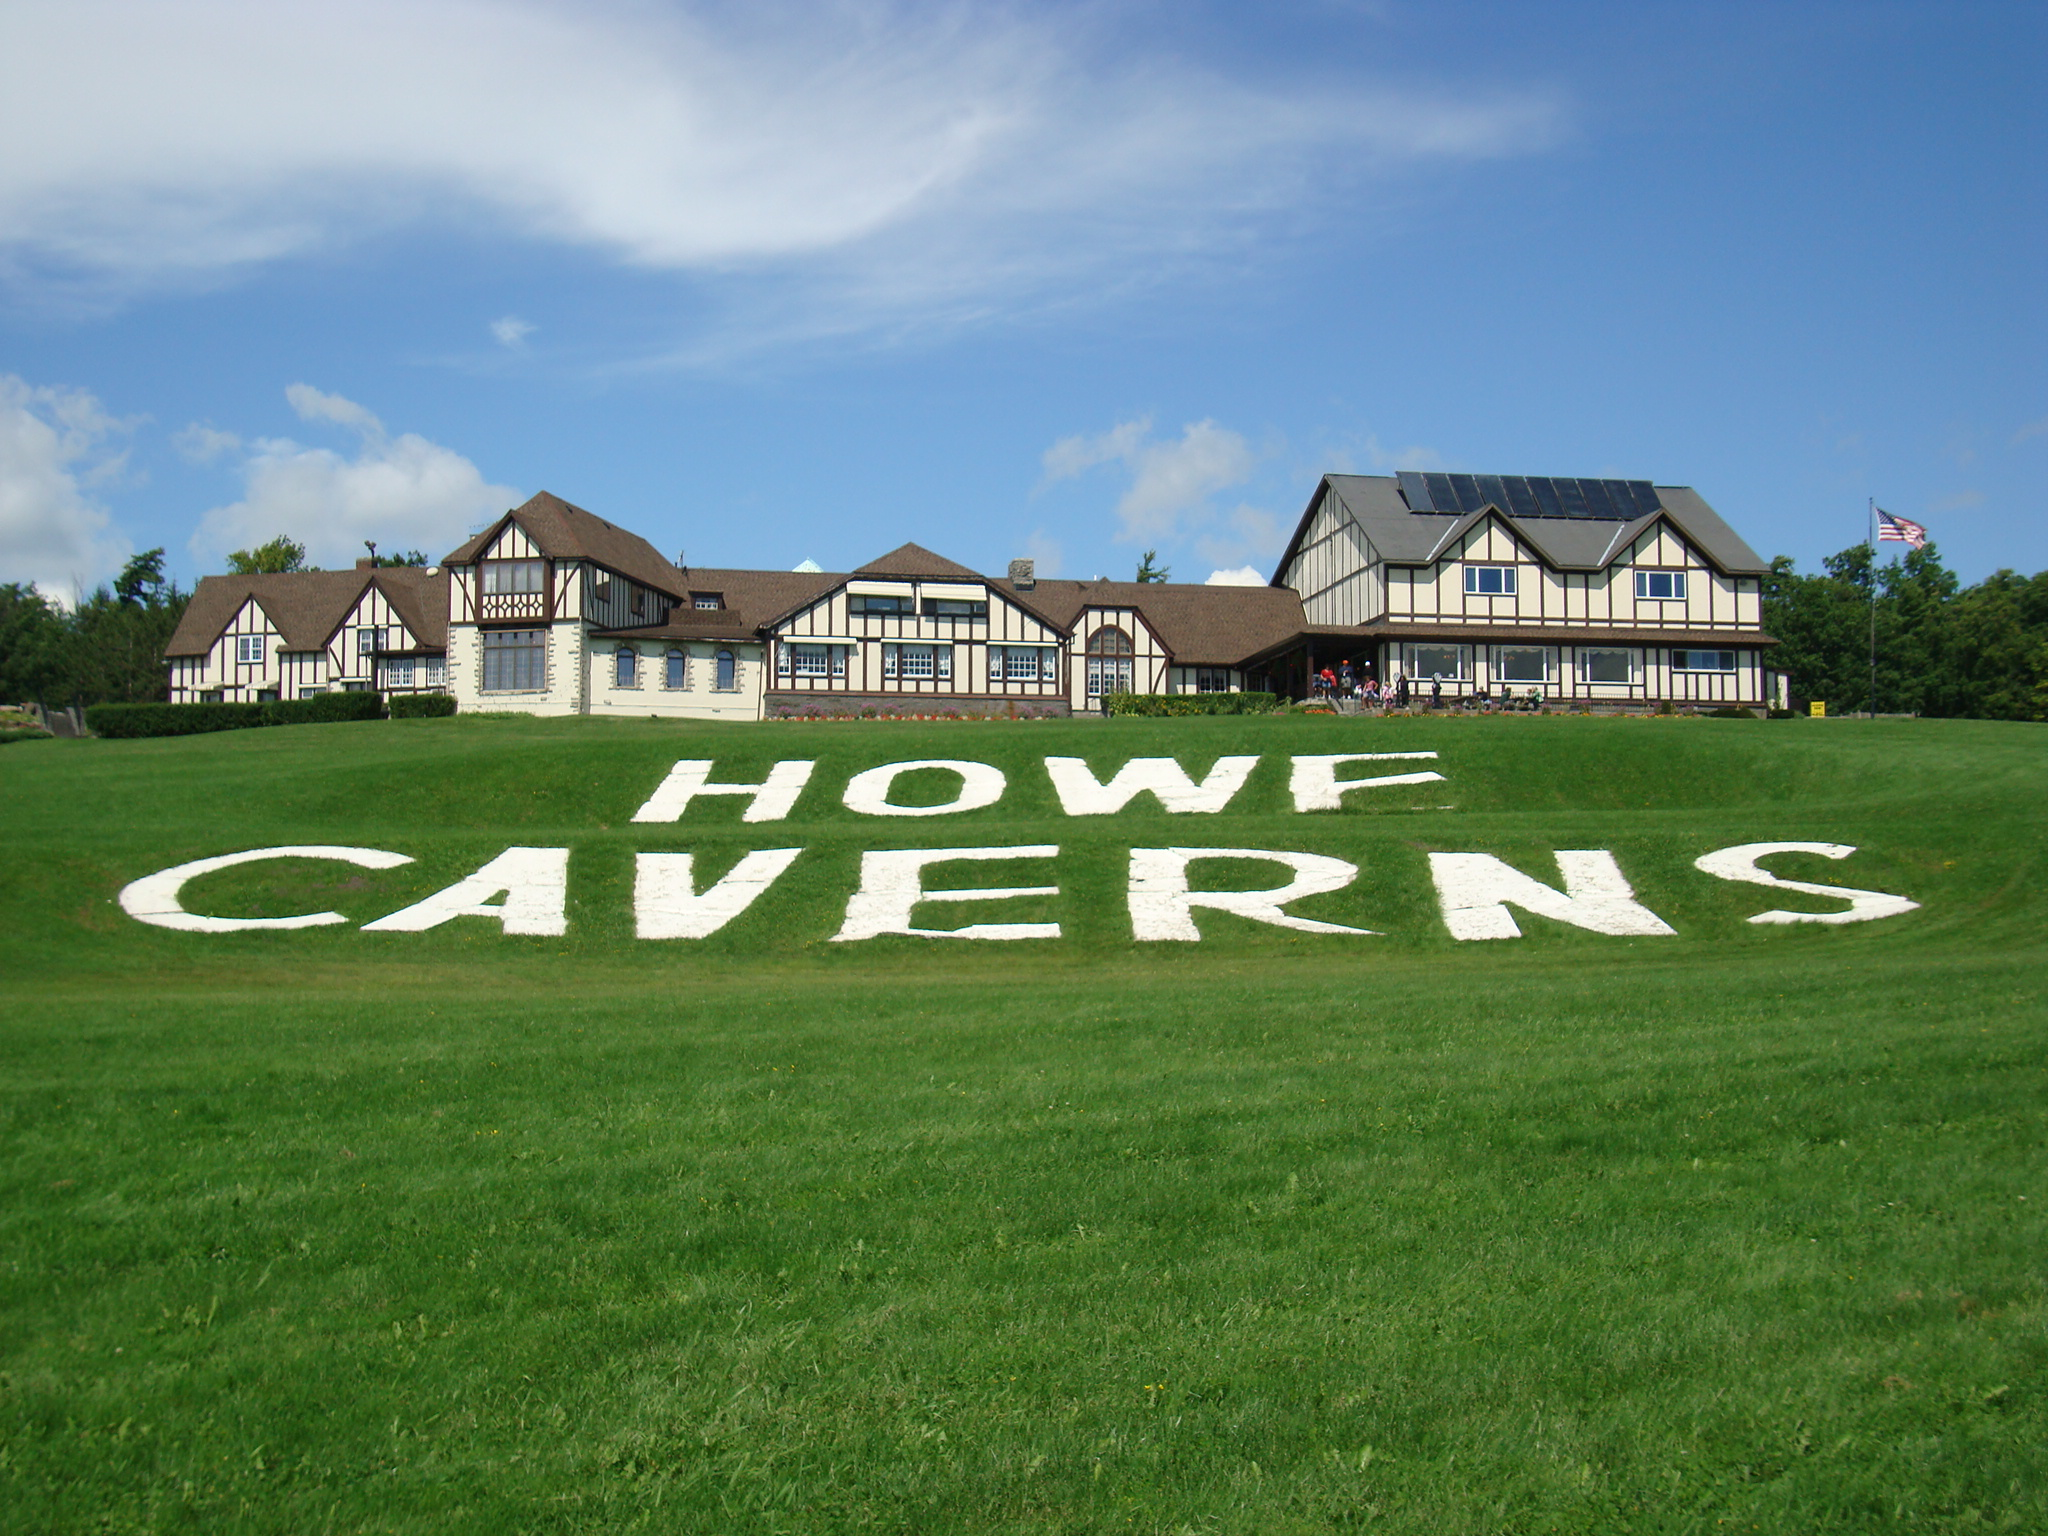 Howe Cavern Lodge